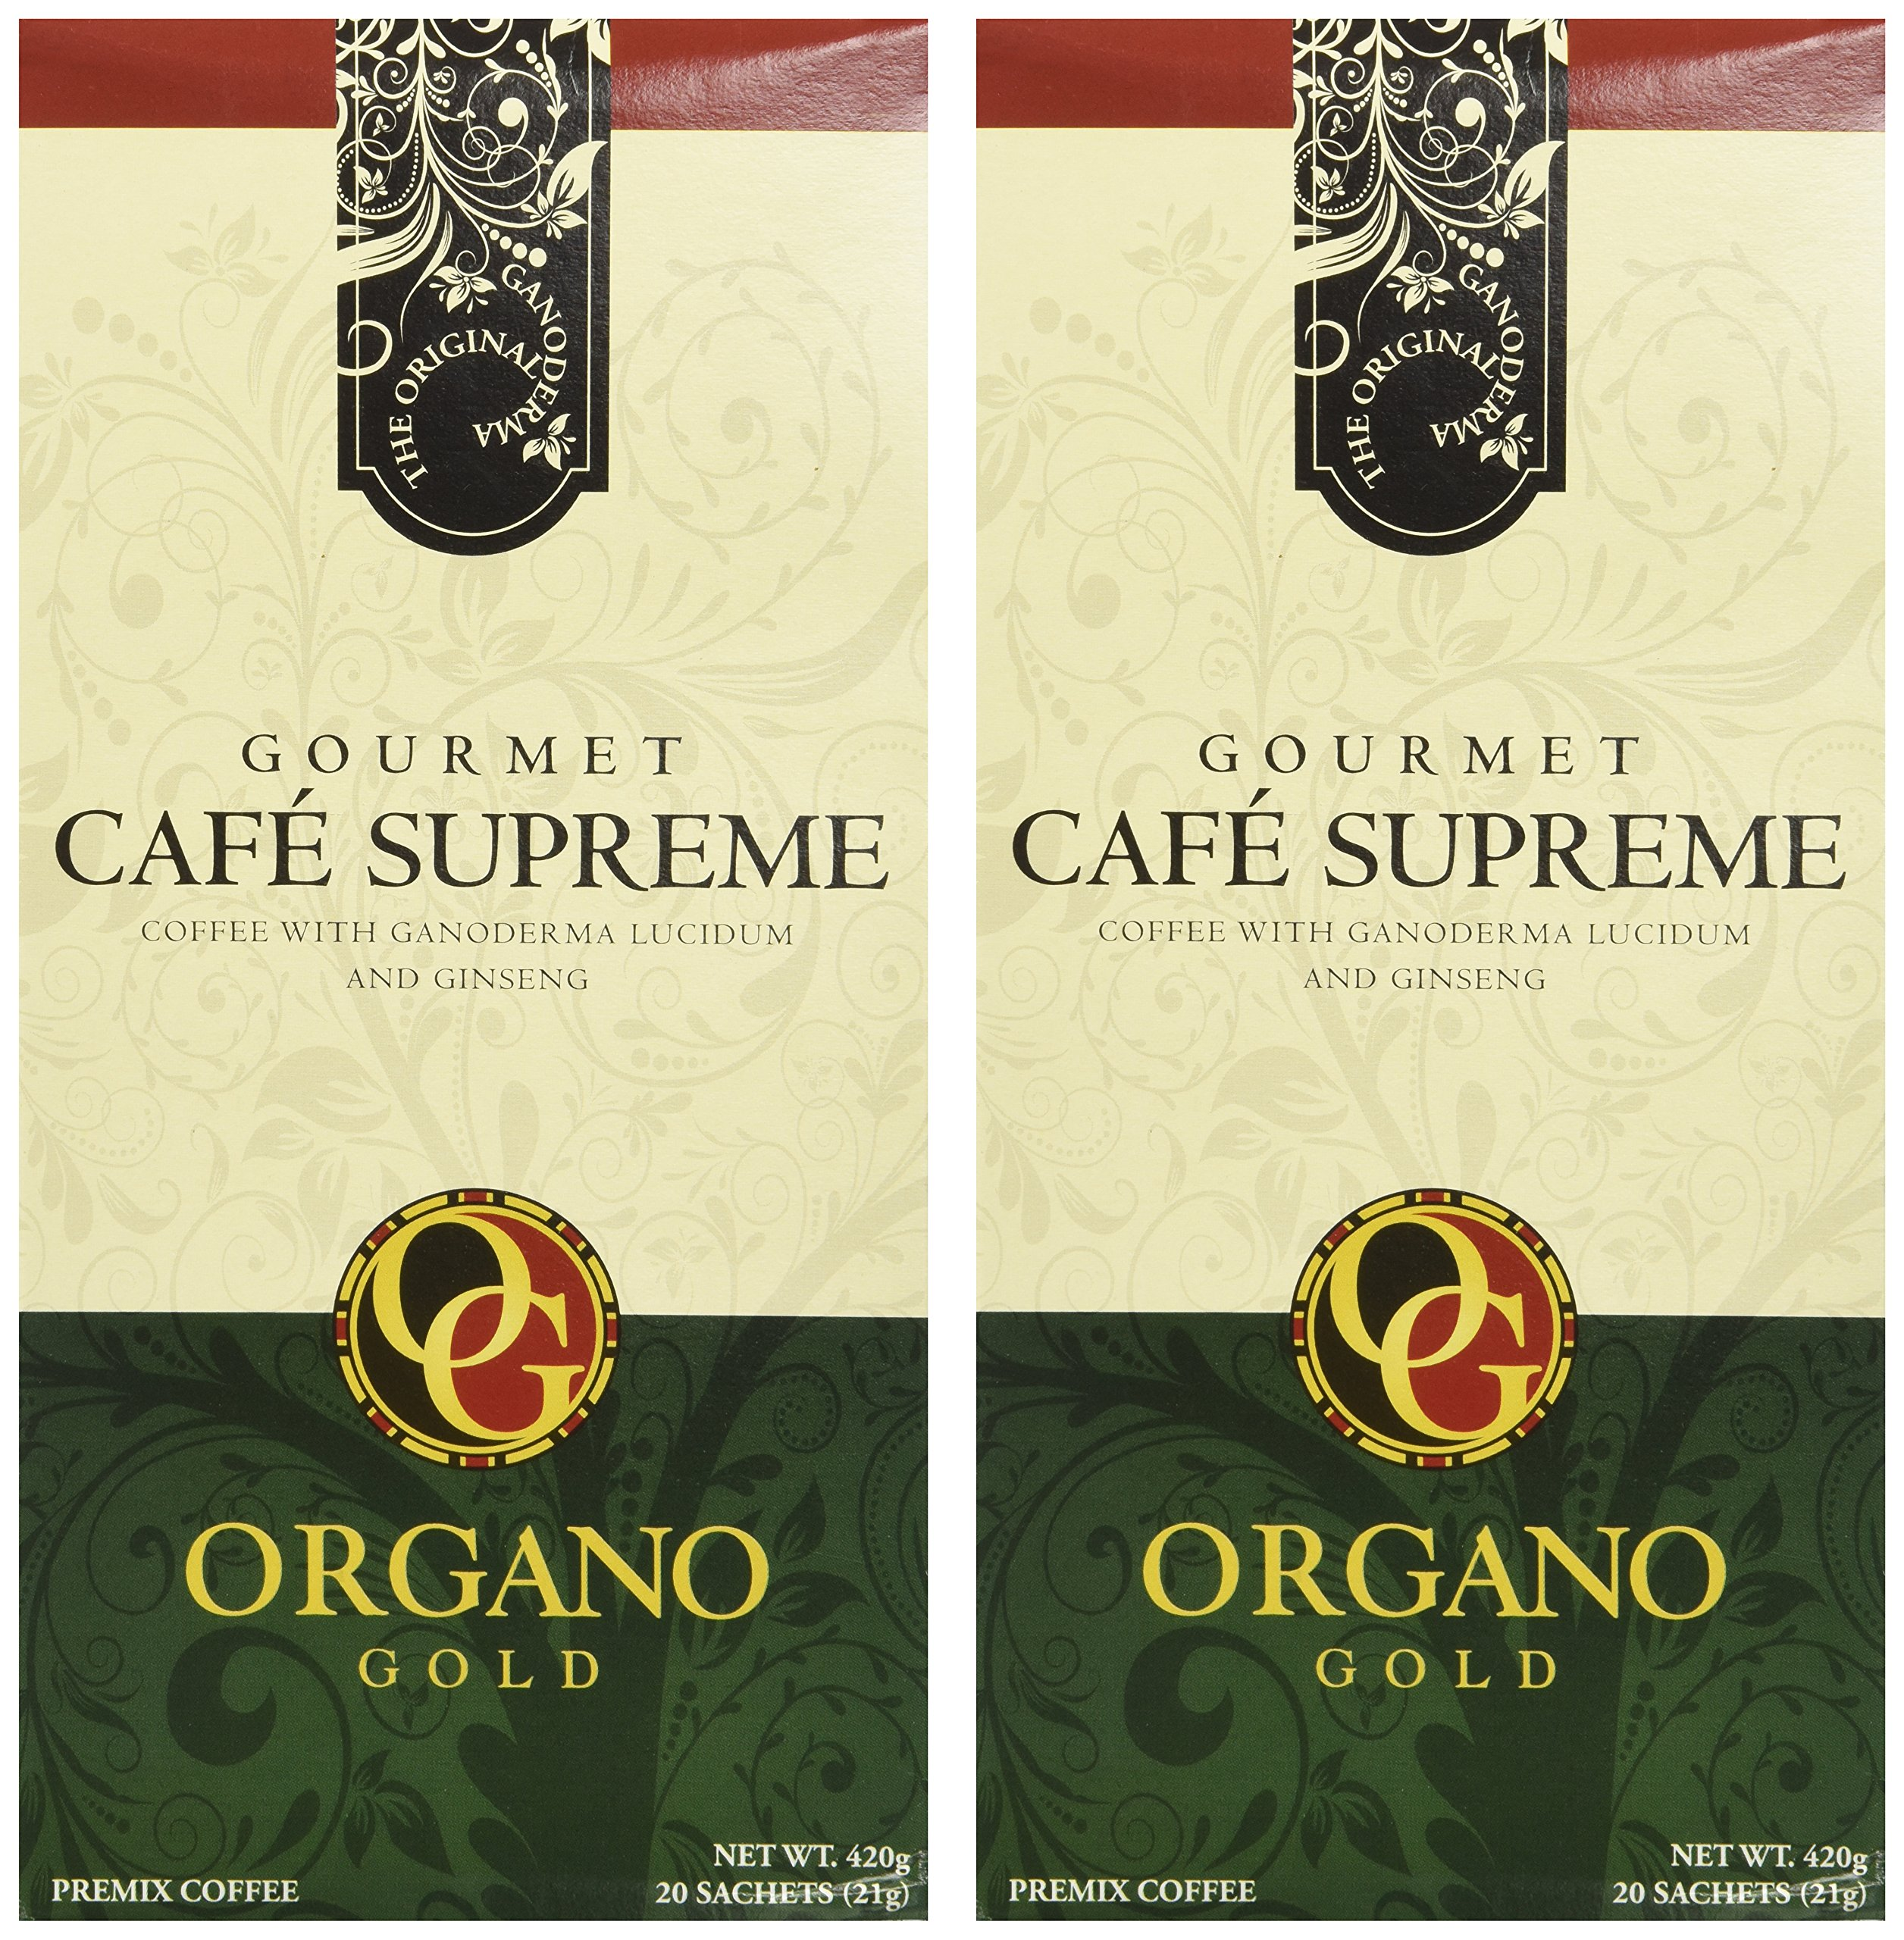 2 Boxes of Organo Gold Ganoderma Gourmet – Café Supreme(20 sachets) by Organo